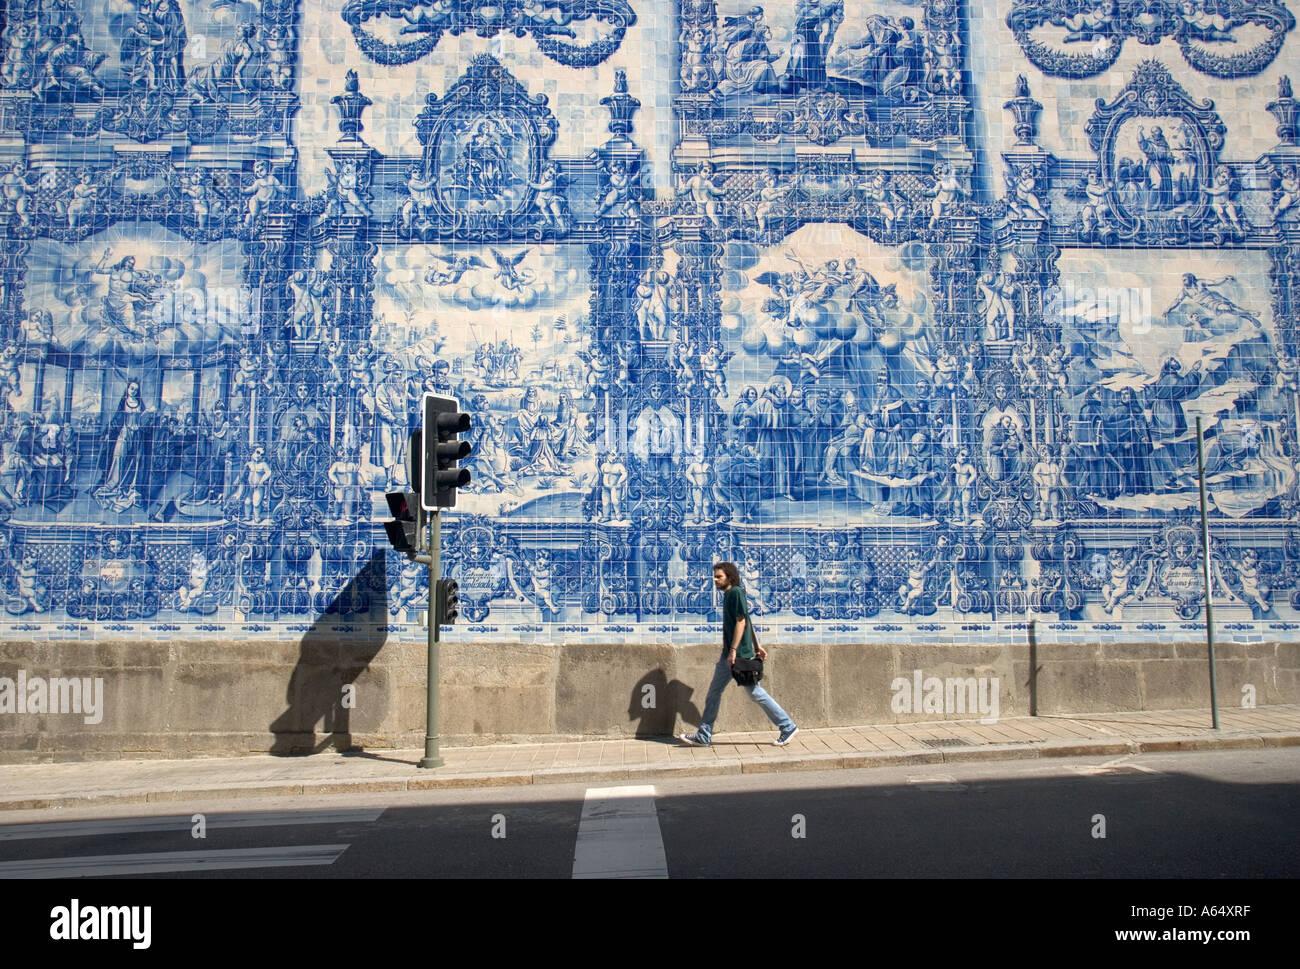 Piastrelle dipinte capela das almas porto foto immagine stock